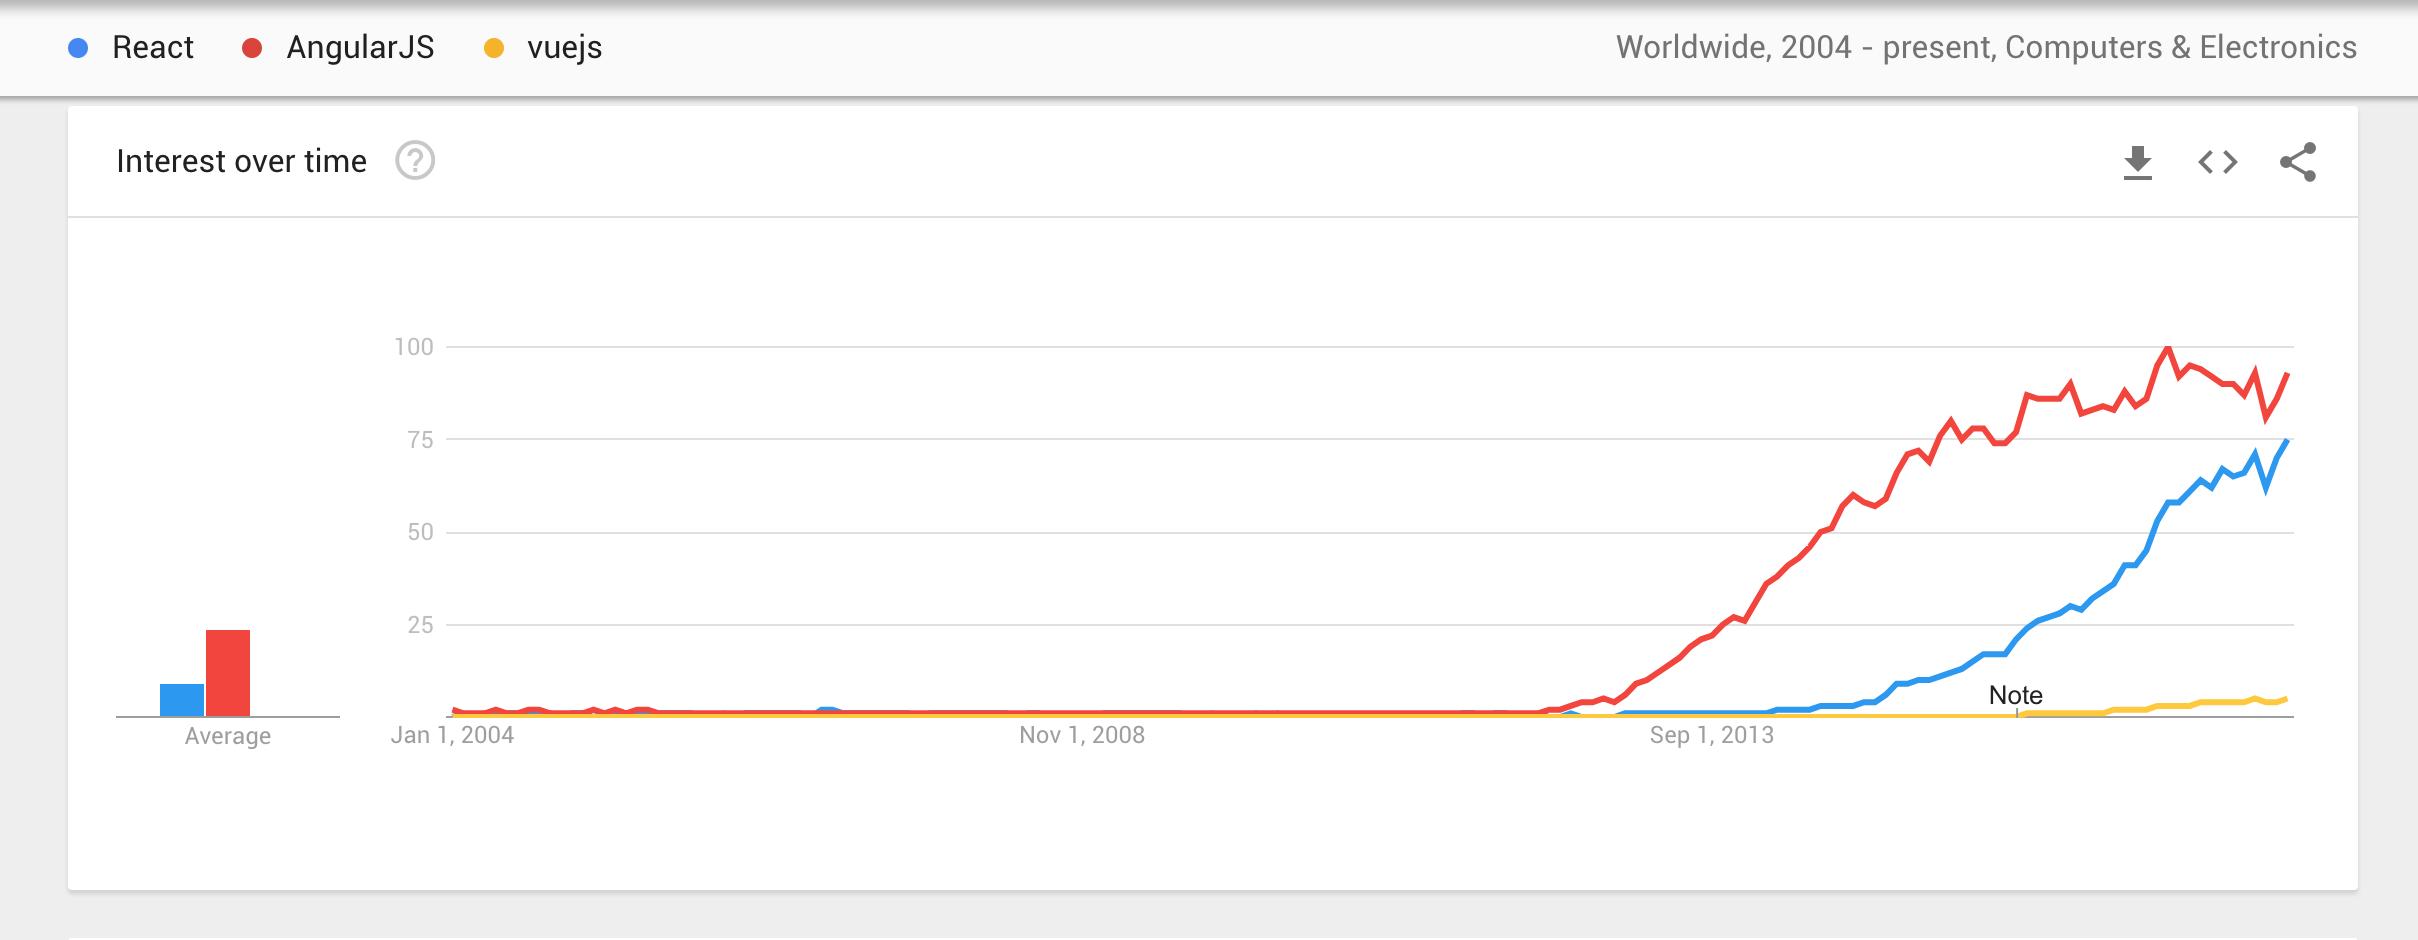 Has Angular started to slowly die? - Quora